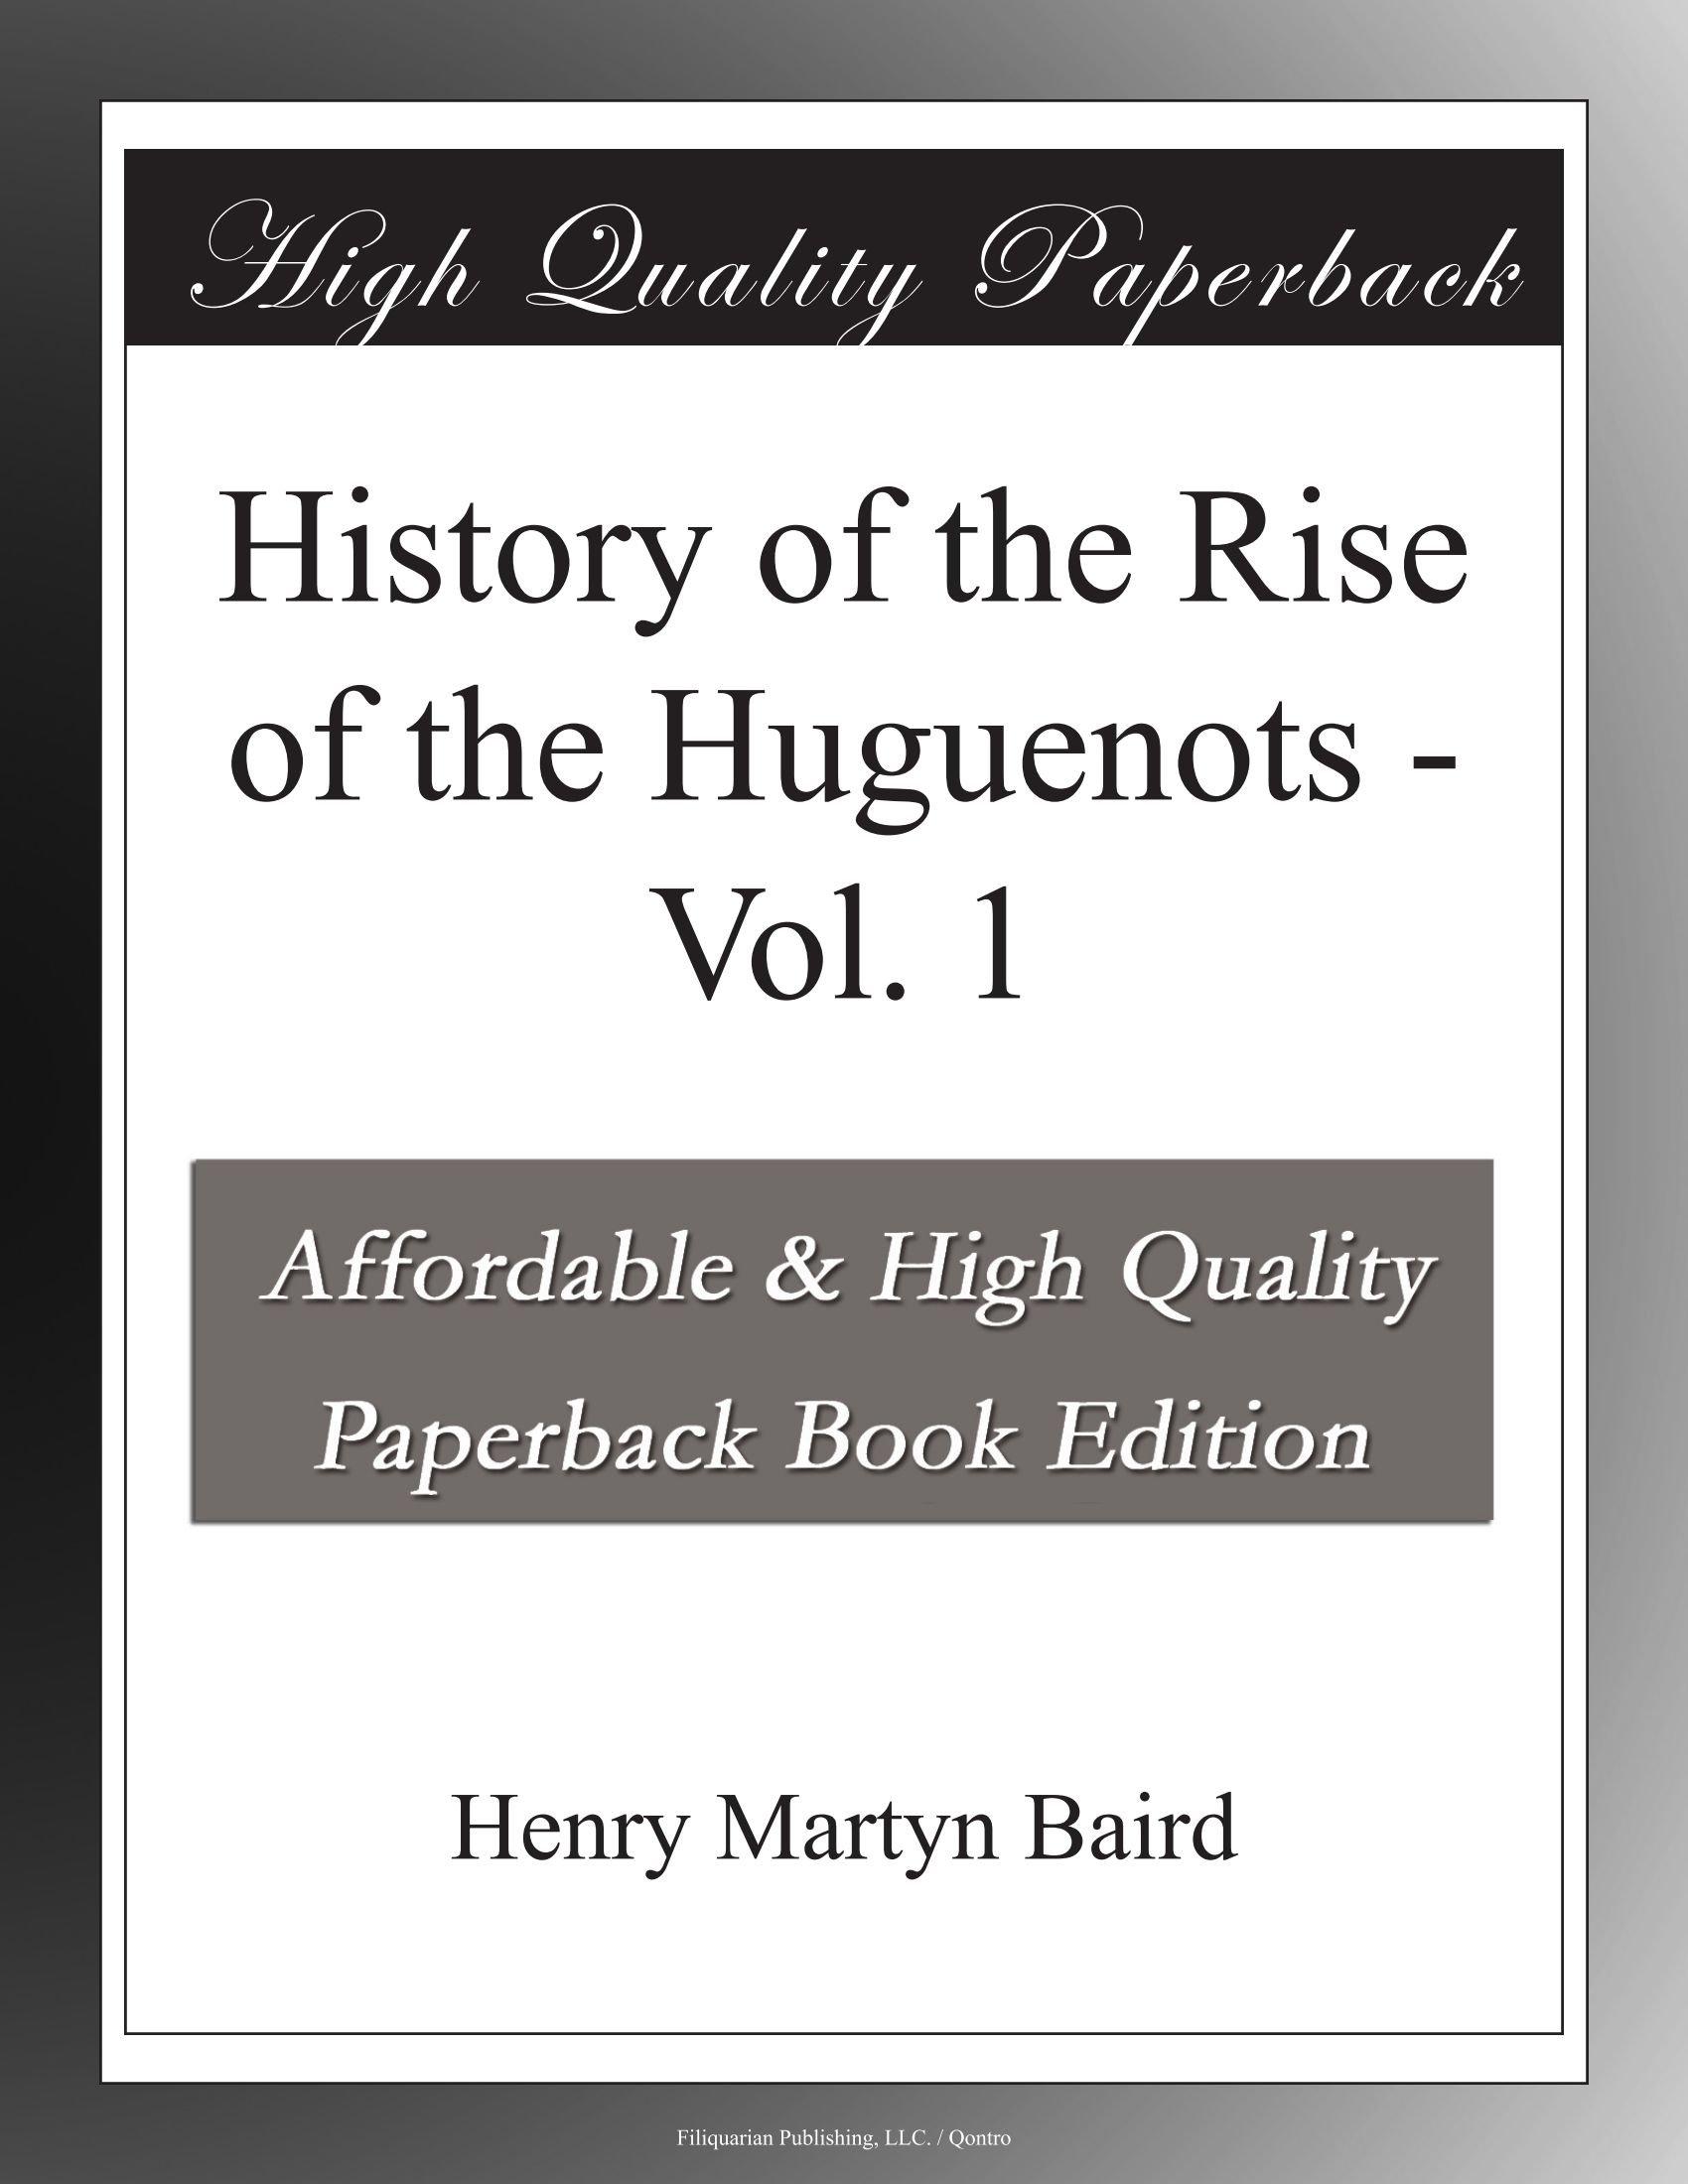 History of the Rise of the Huguenots - Vol. 1 ebook